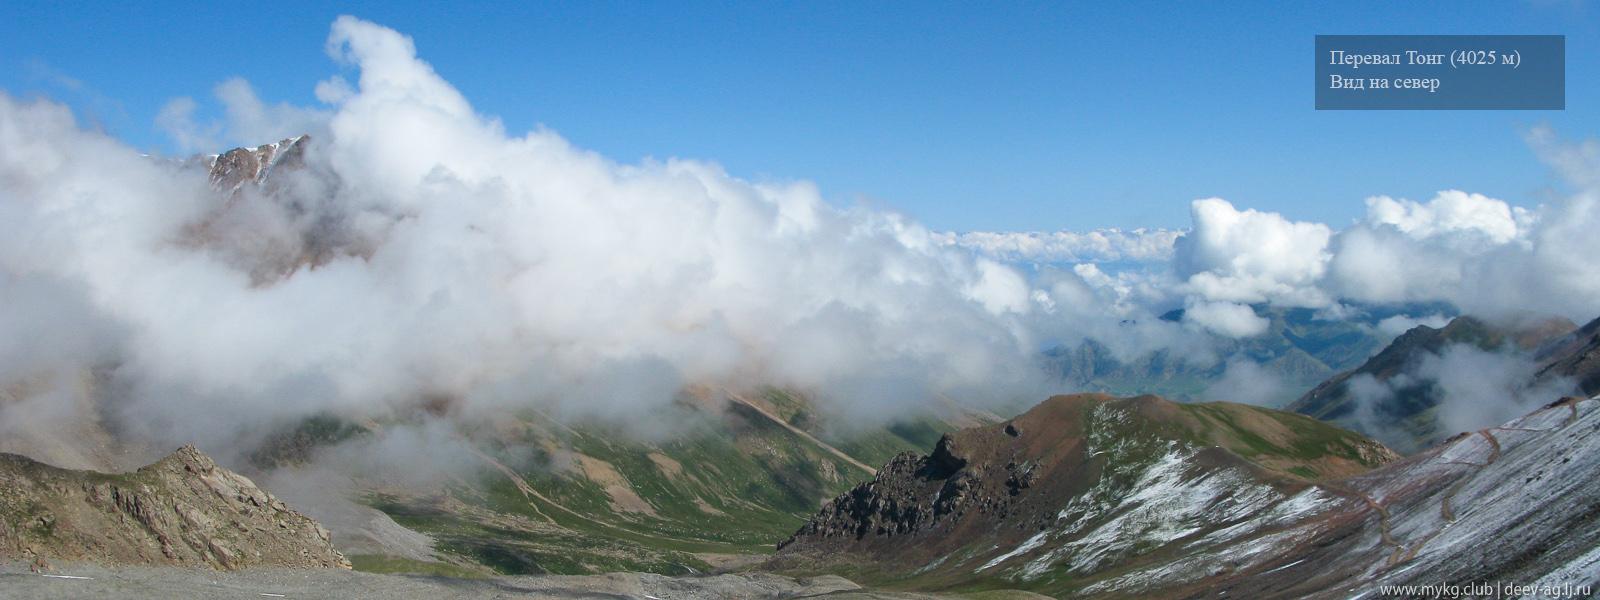 Перевал Тонг (4025 м). Вид на север.